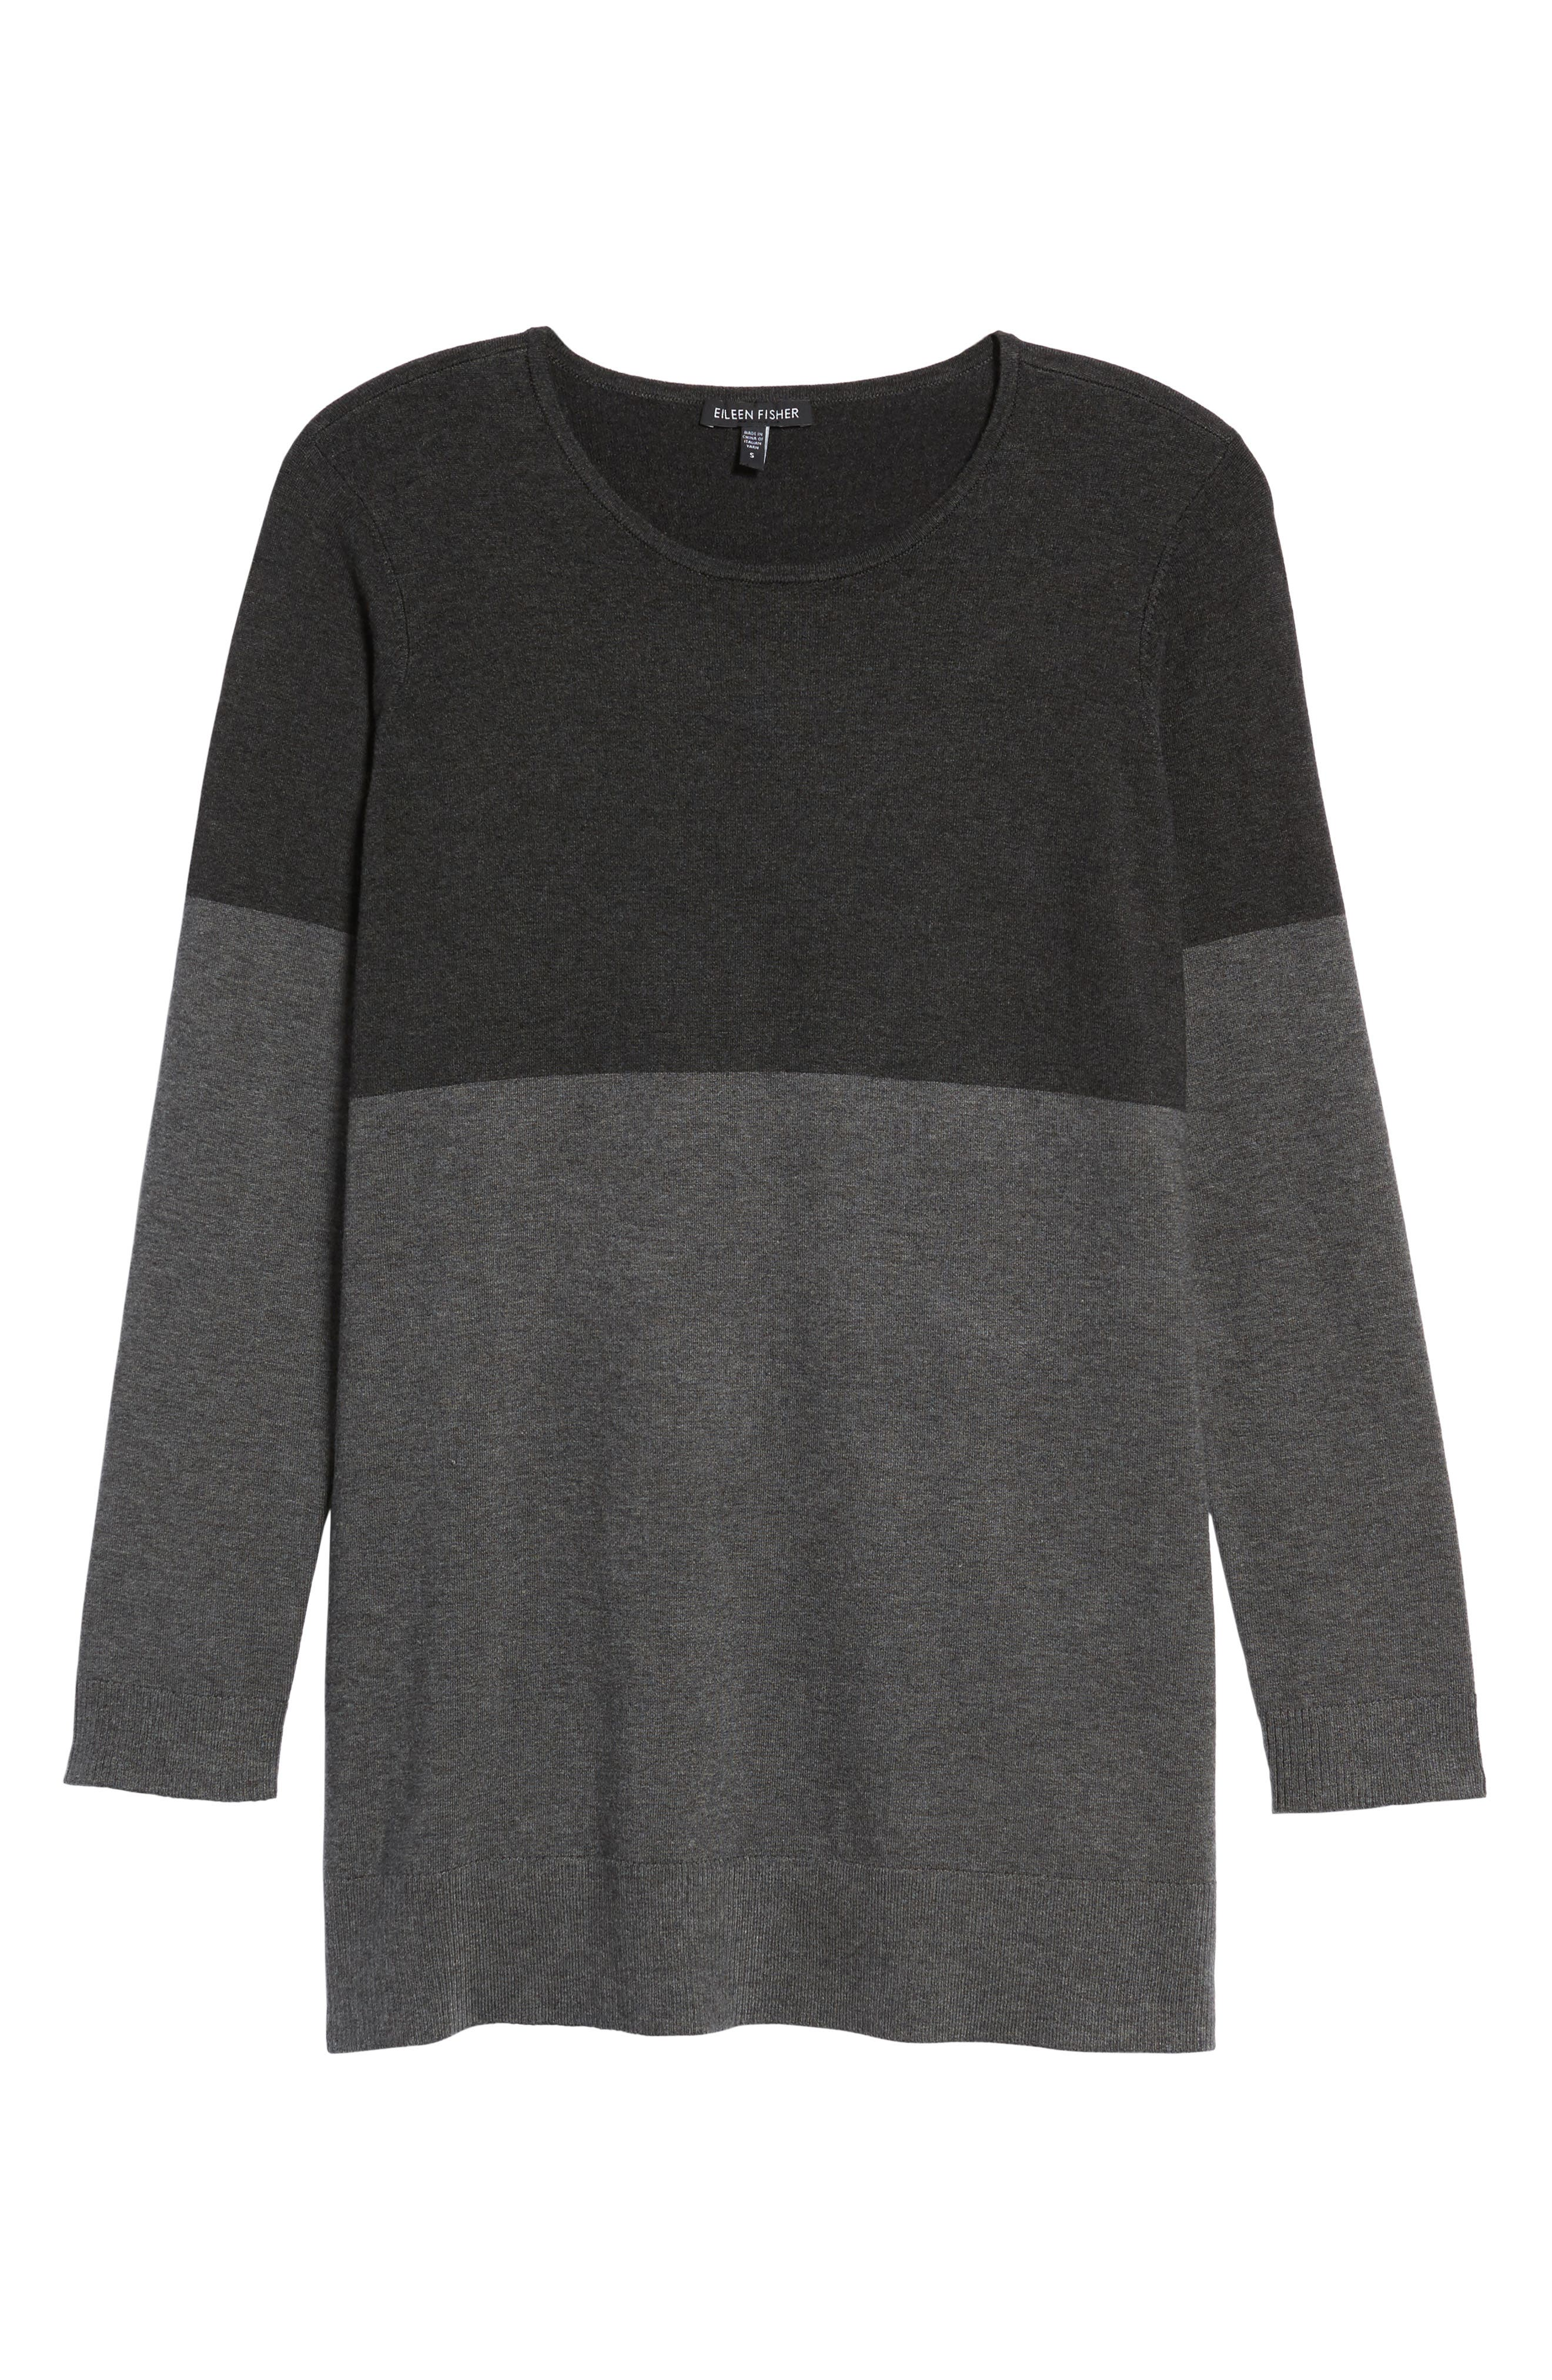 Colorblock Tencel<sup>®</sup> Blend Sweater,                             Alternate thumbnail 6, color,                             064